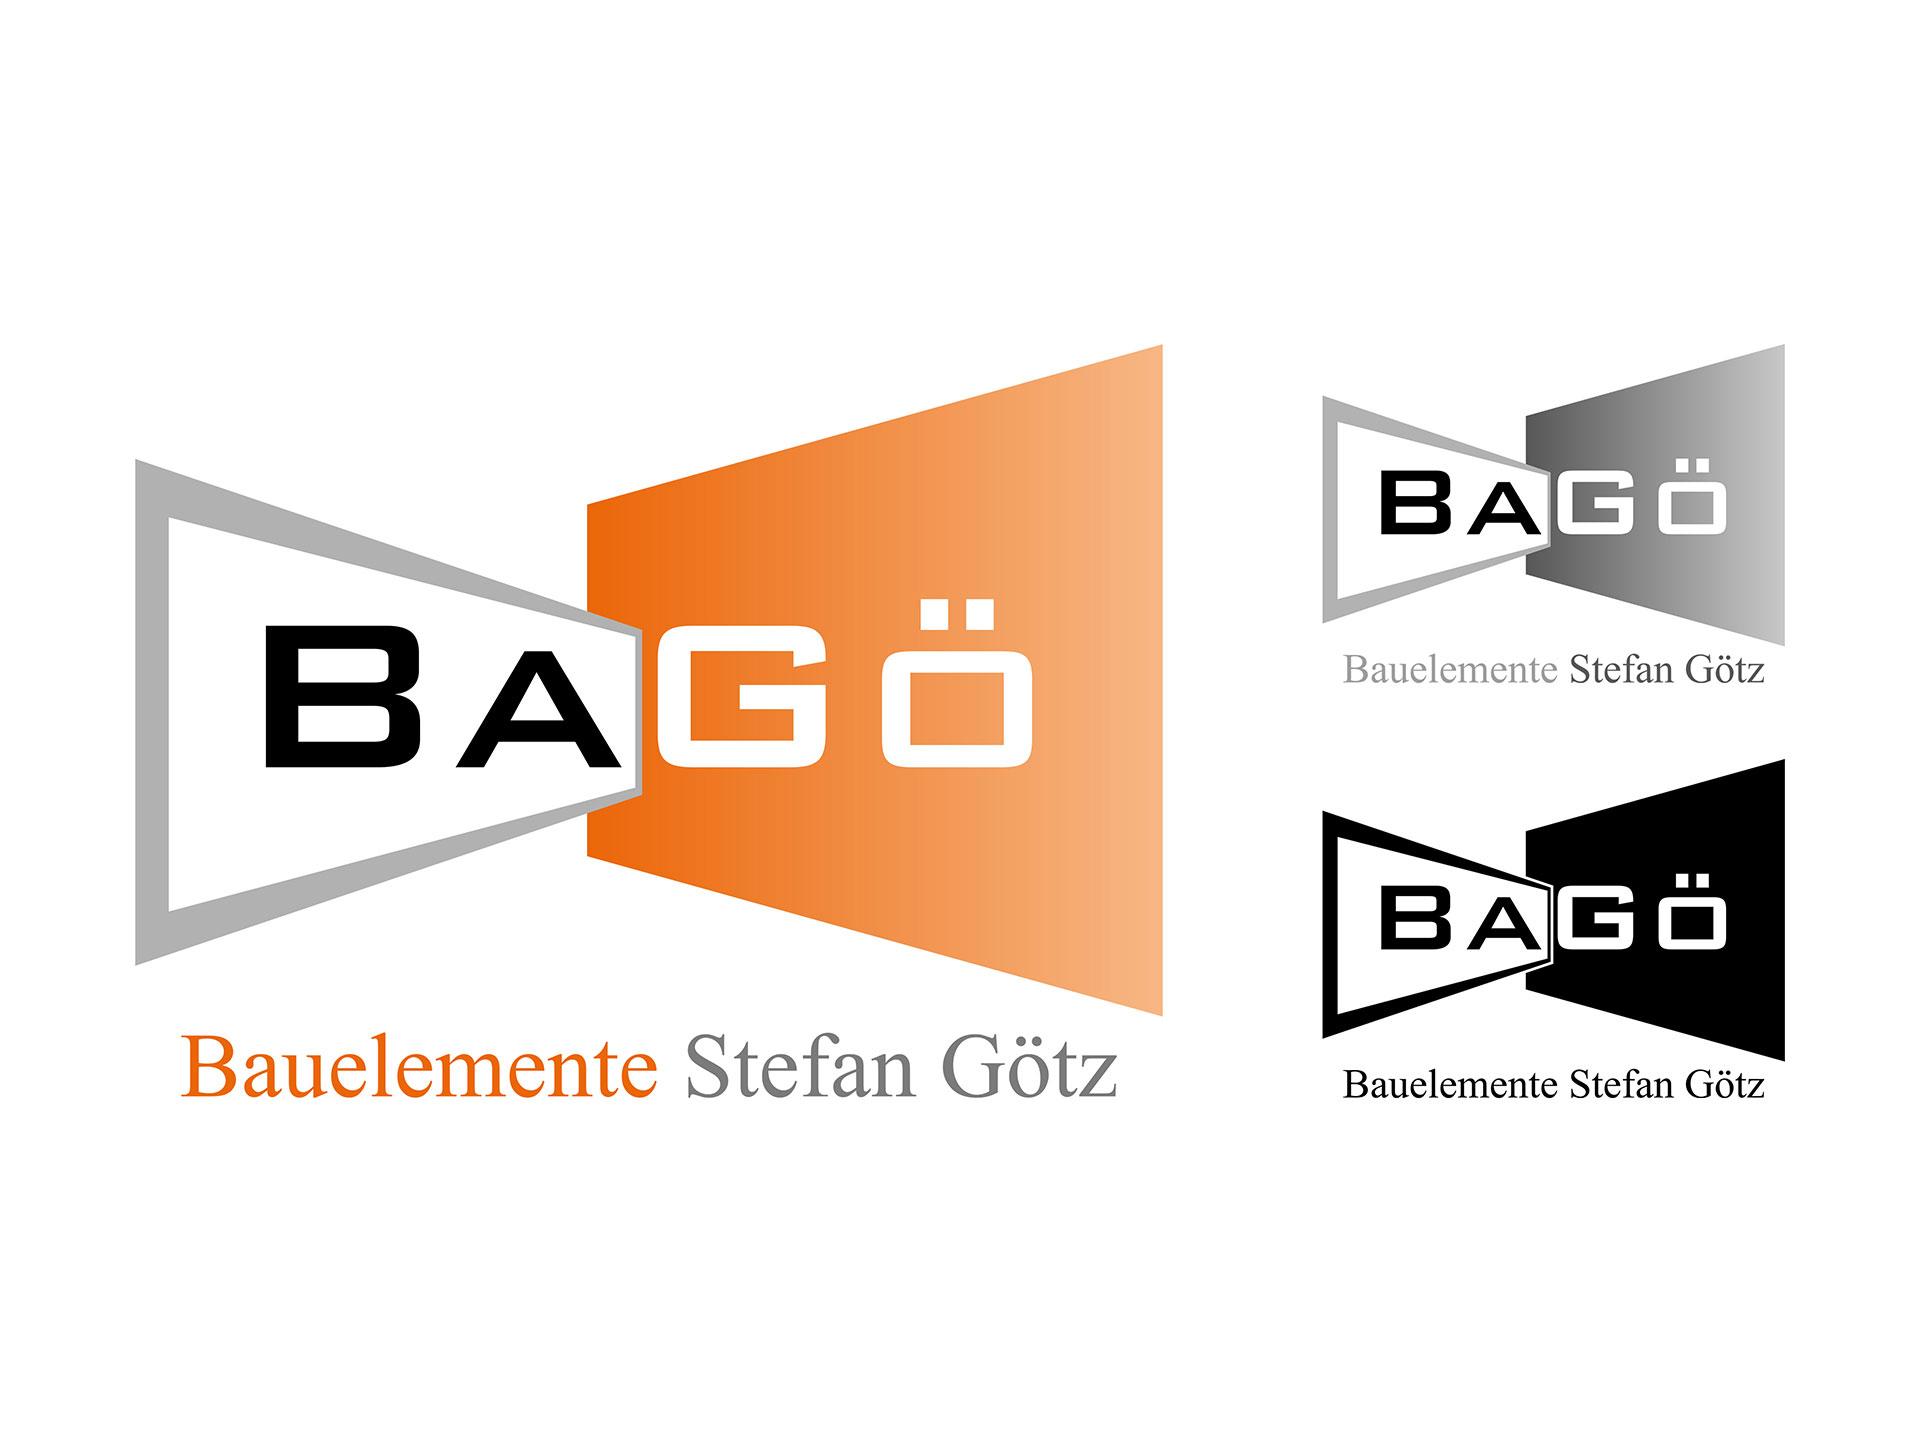 Logo BaGö - farbig, grau und schwarz-weiß